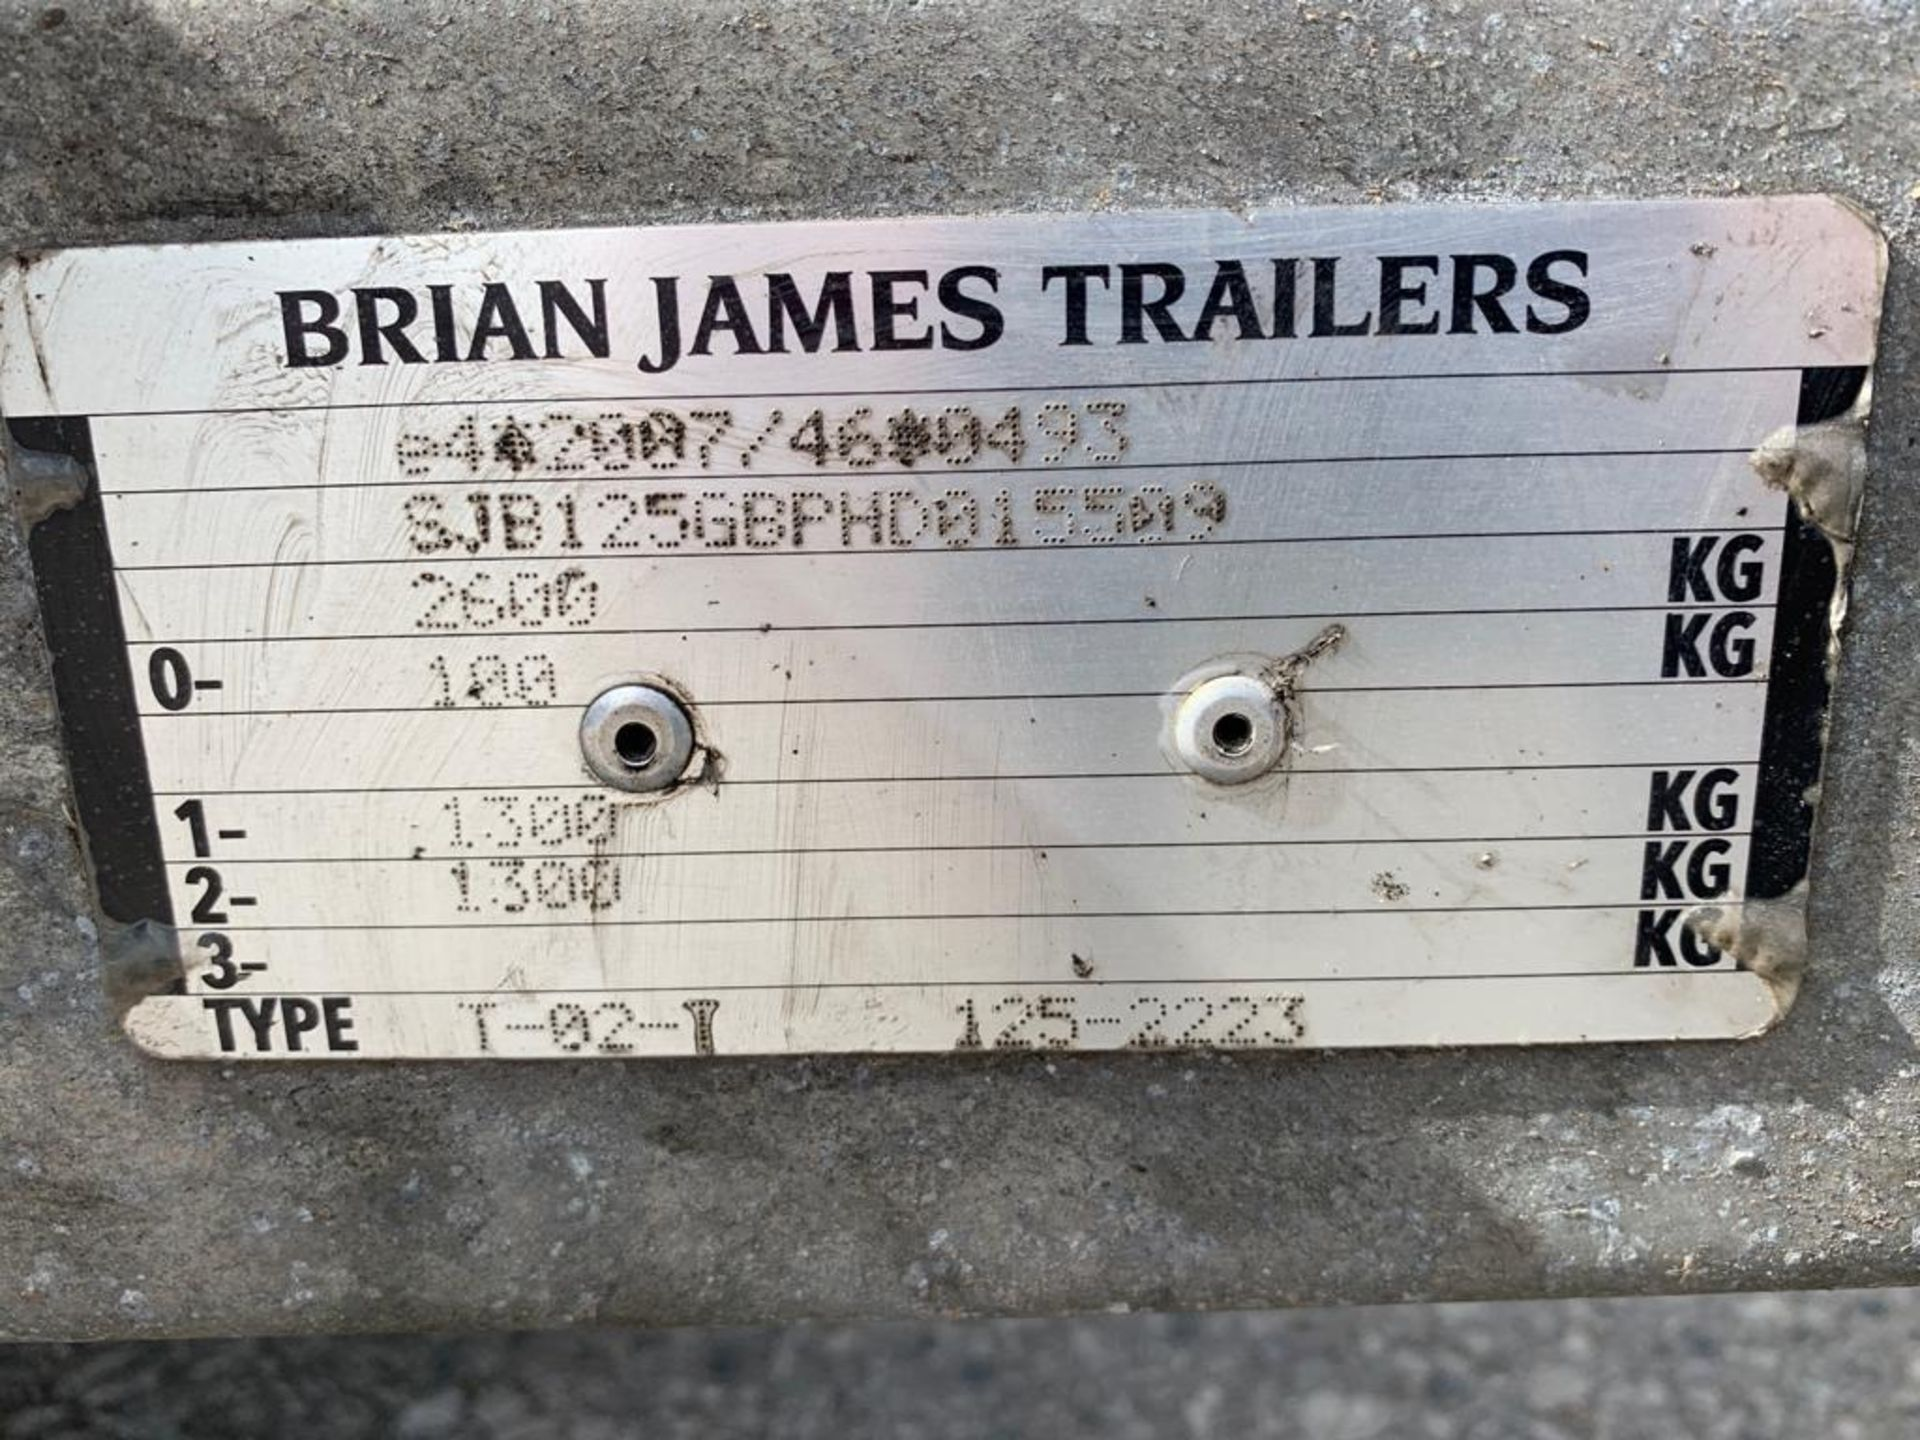 Lot 46 - BRIAN JAMES TRAILERS TWIN AXLE 2600KG VEHICLE TRAILER WITH WHEEL RACK & STORAGE *PLUS VAT*